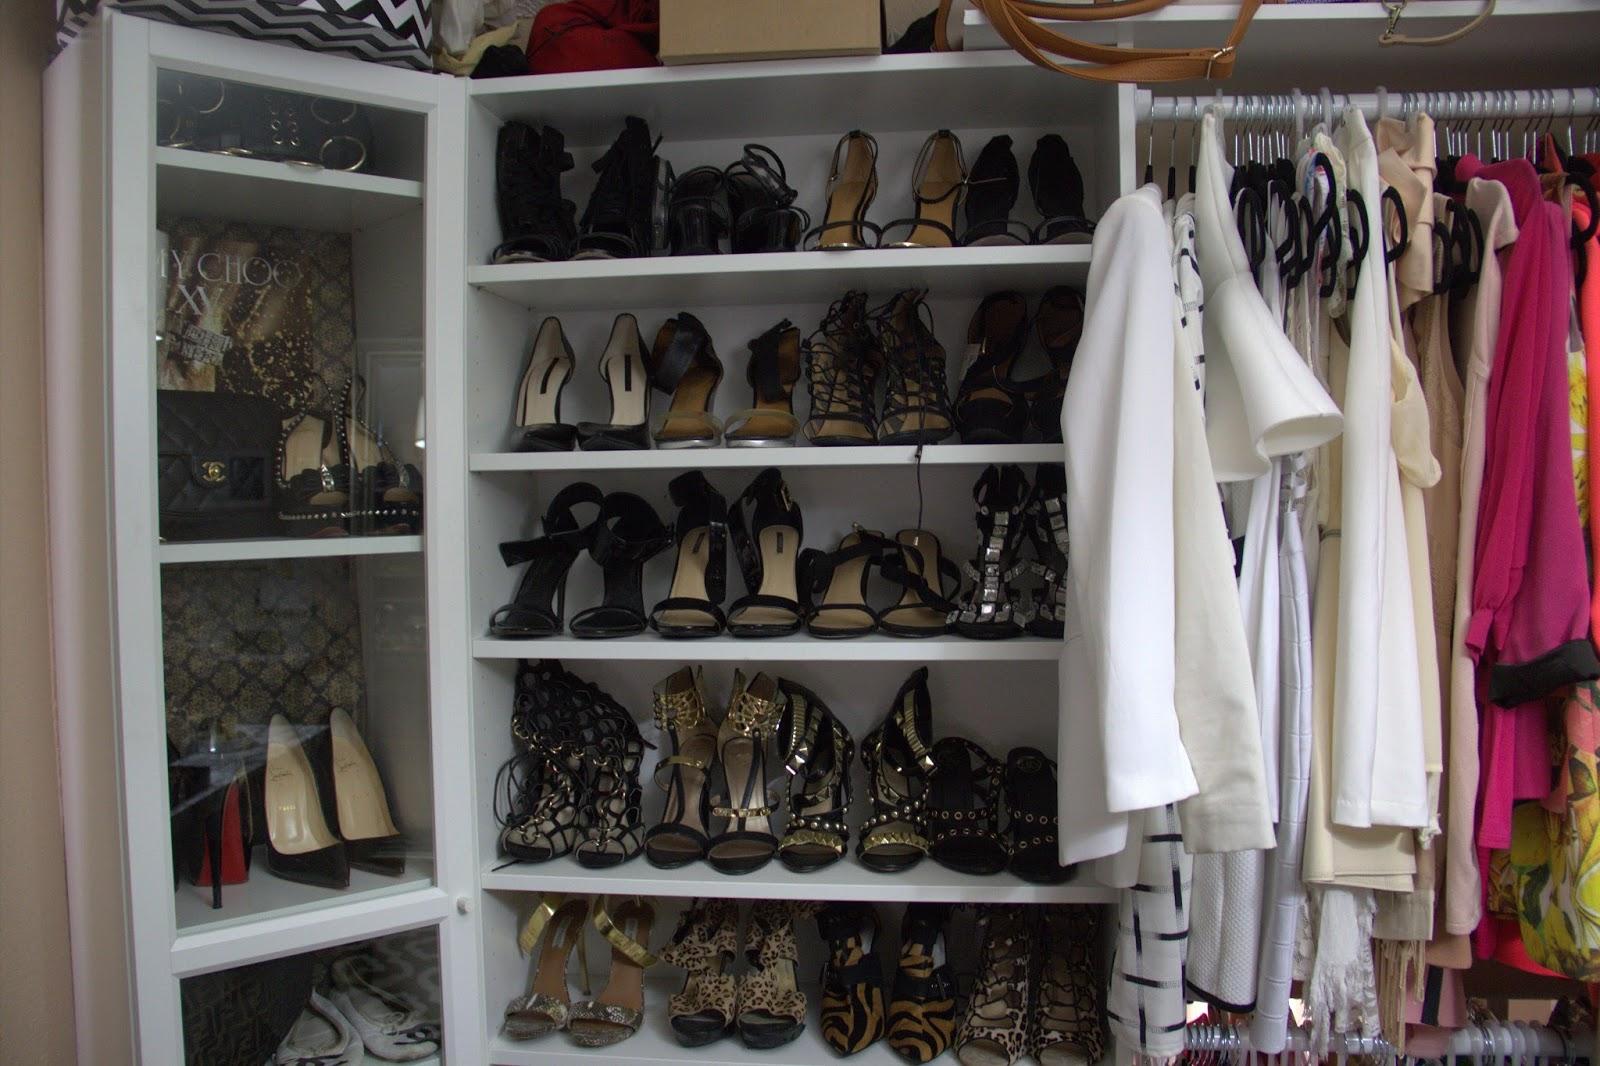 bookcases for shoes, ikea hack, ikea shoe closet hack, ikea coset hack